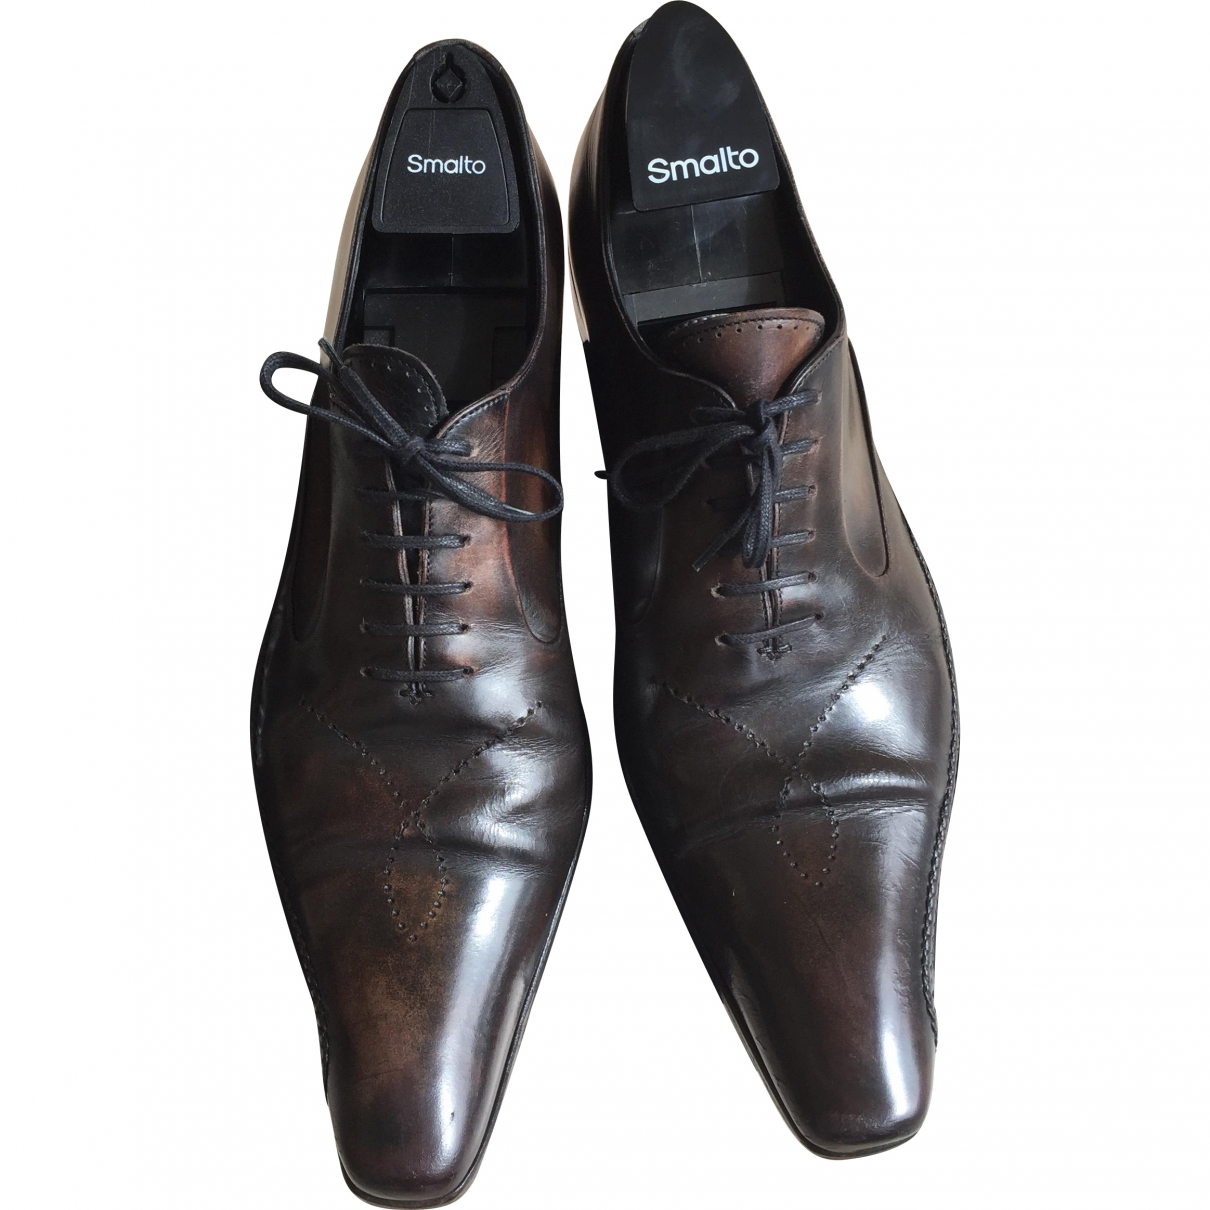 Francesco Smalto \N Brown Leather Lace ups for Men 43 EU